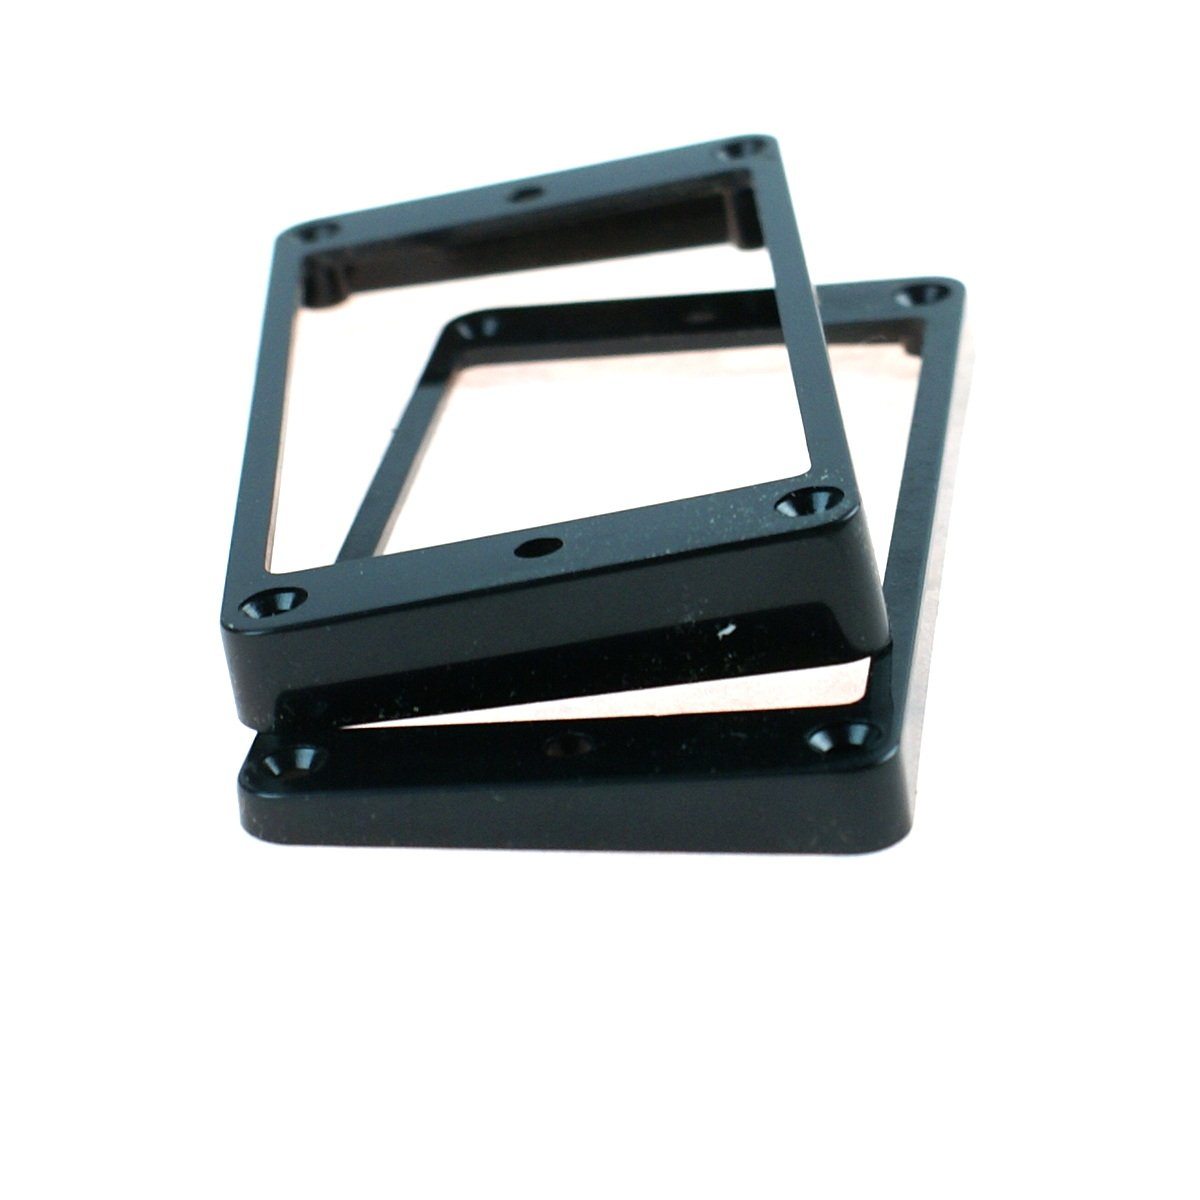 Set of 2 Humbucker Pickup Mounting Rings for bridge and neck pckups,Flat Bottom Black